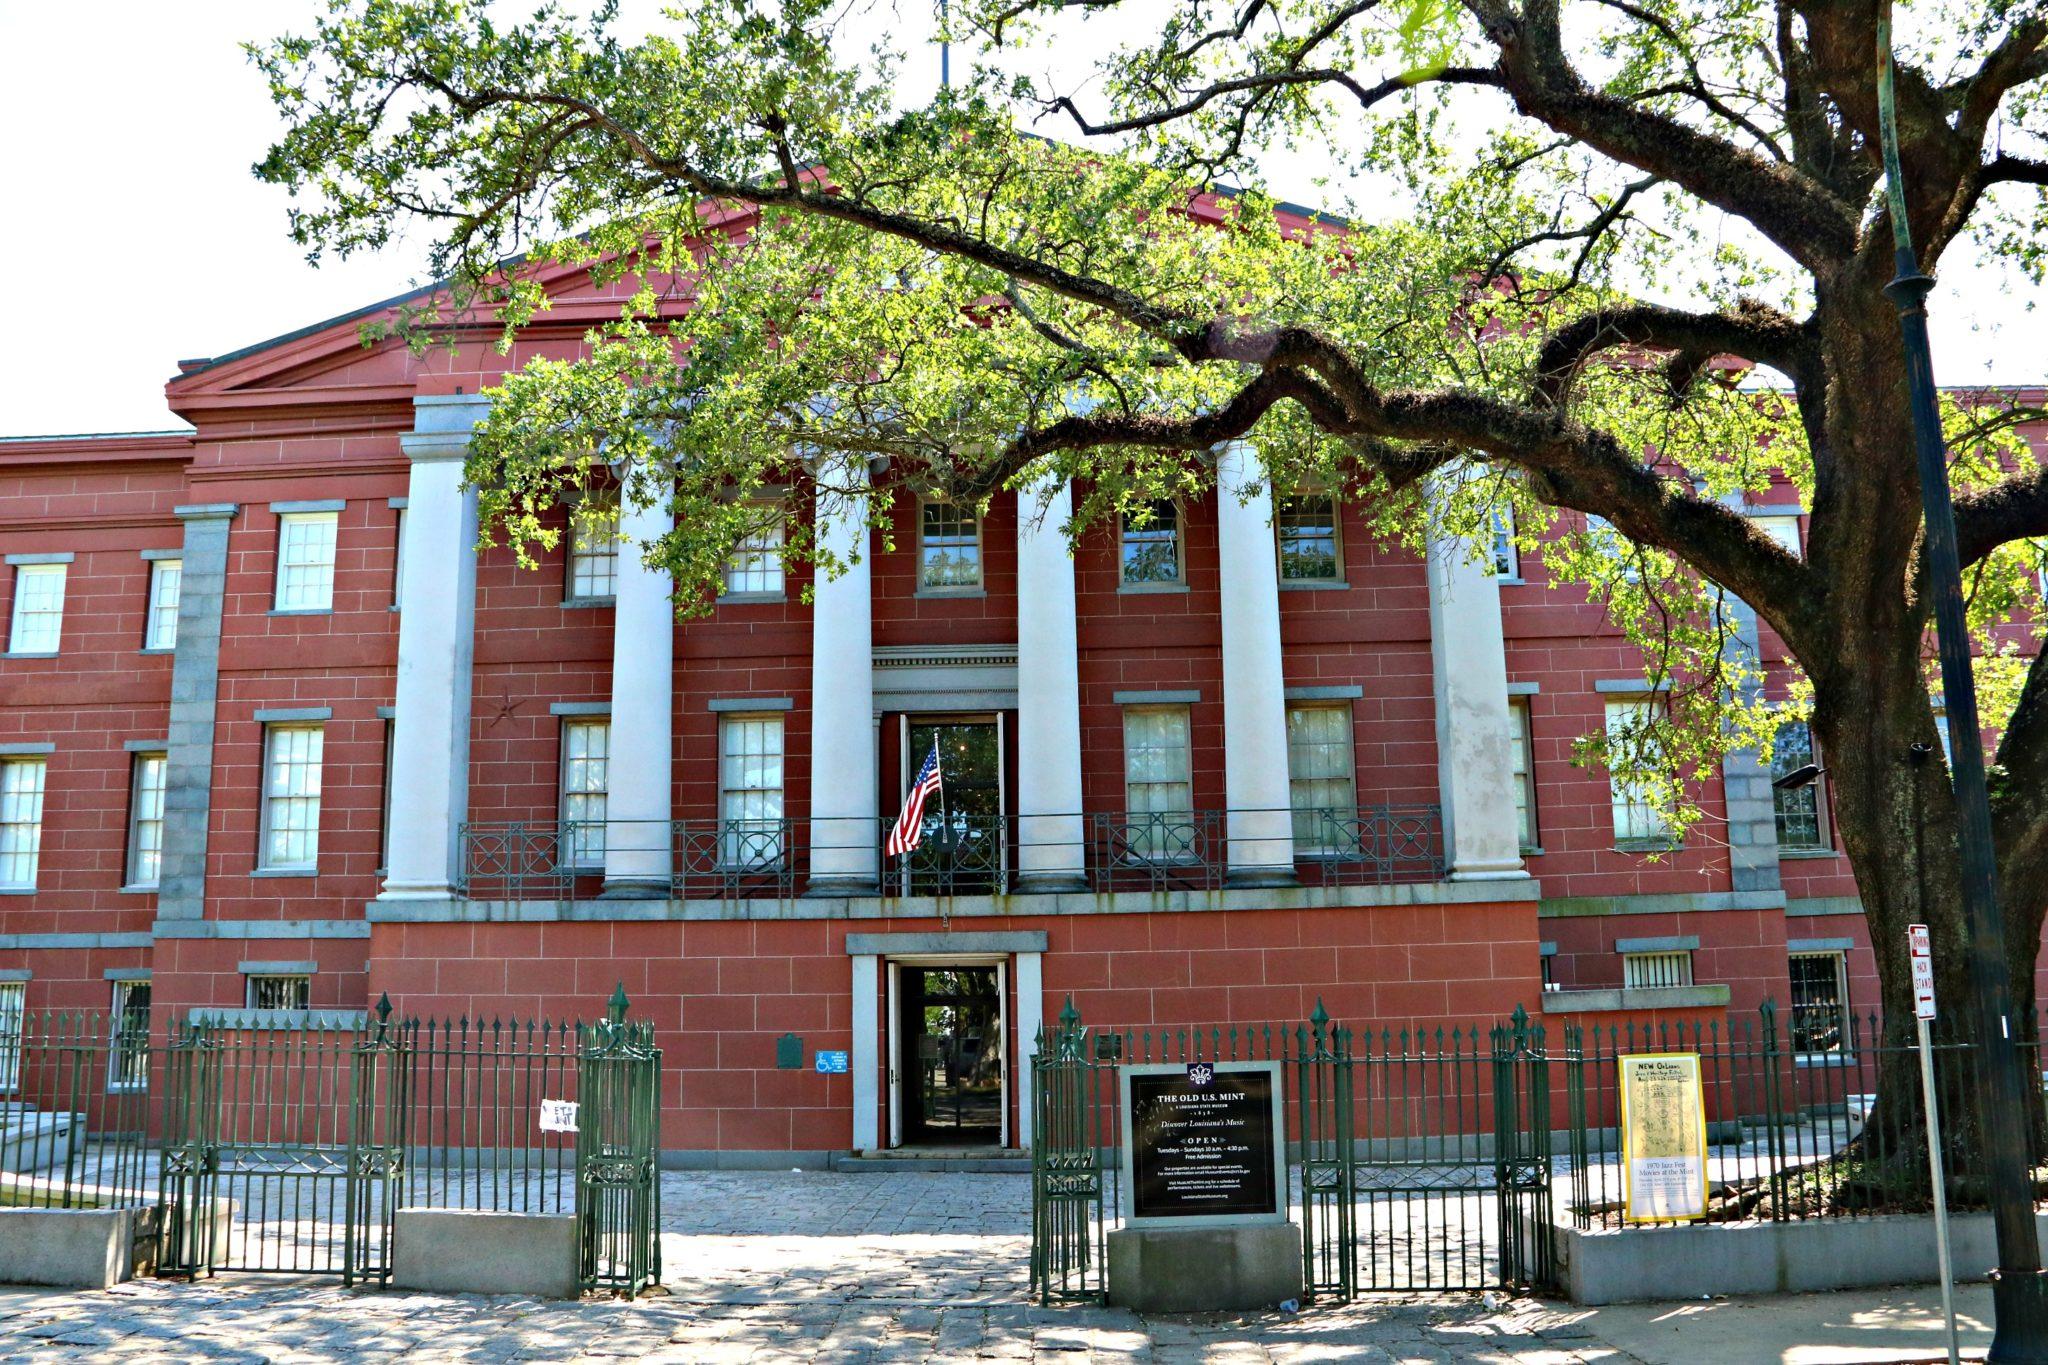 New Orleans Mint on Esplanade Avenue